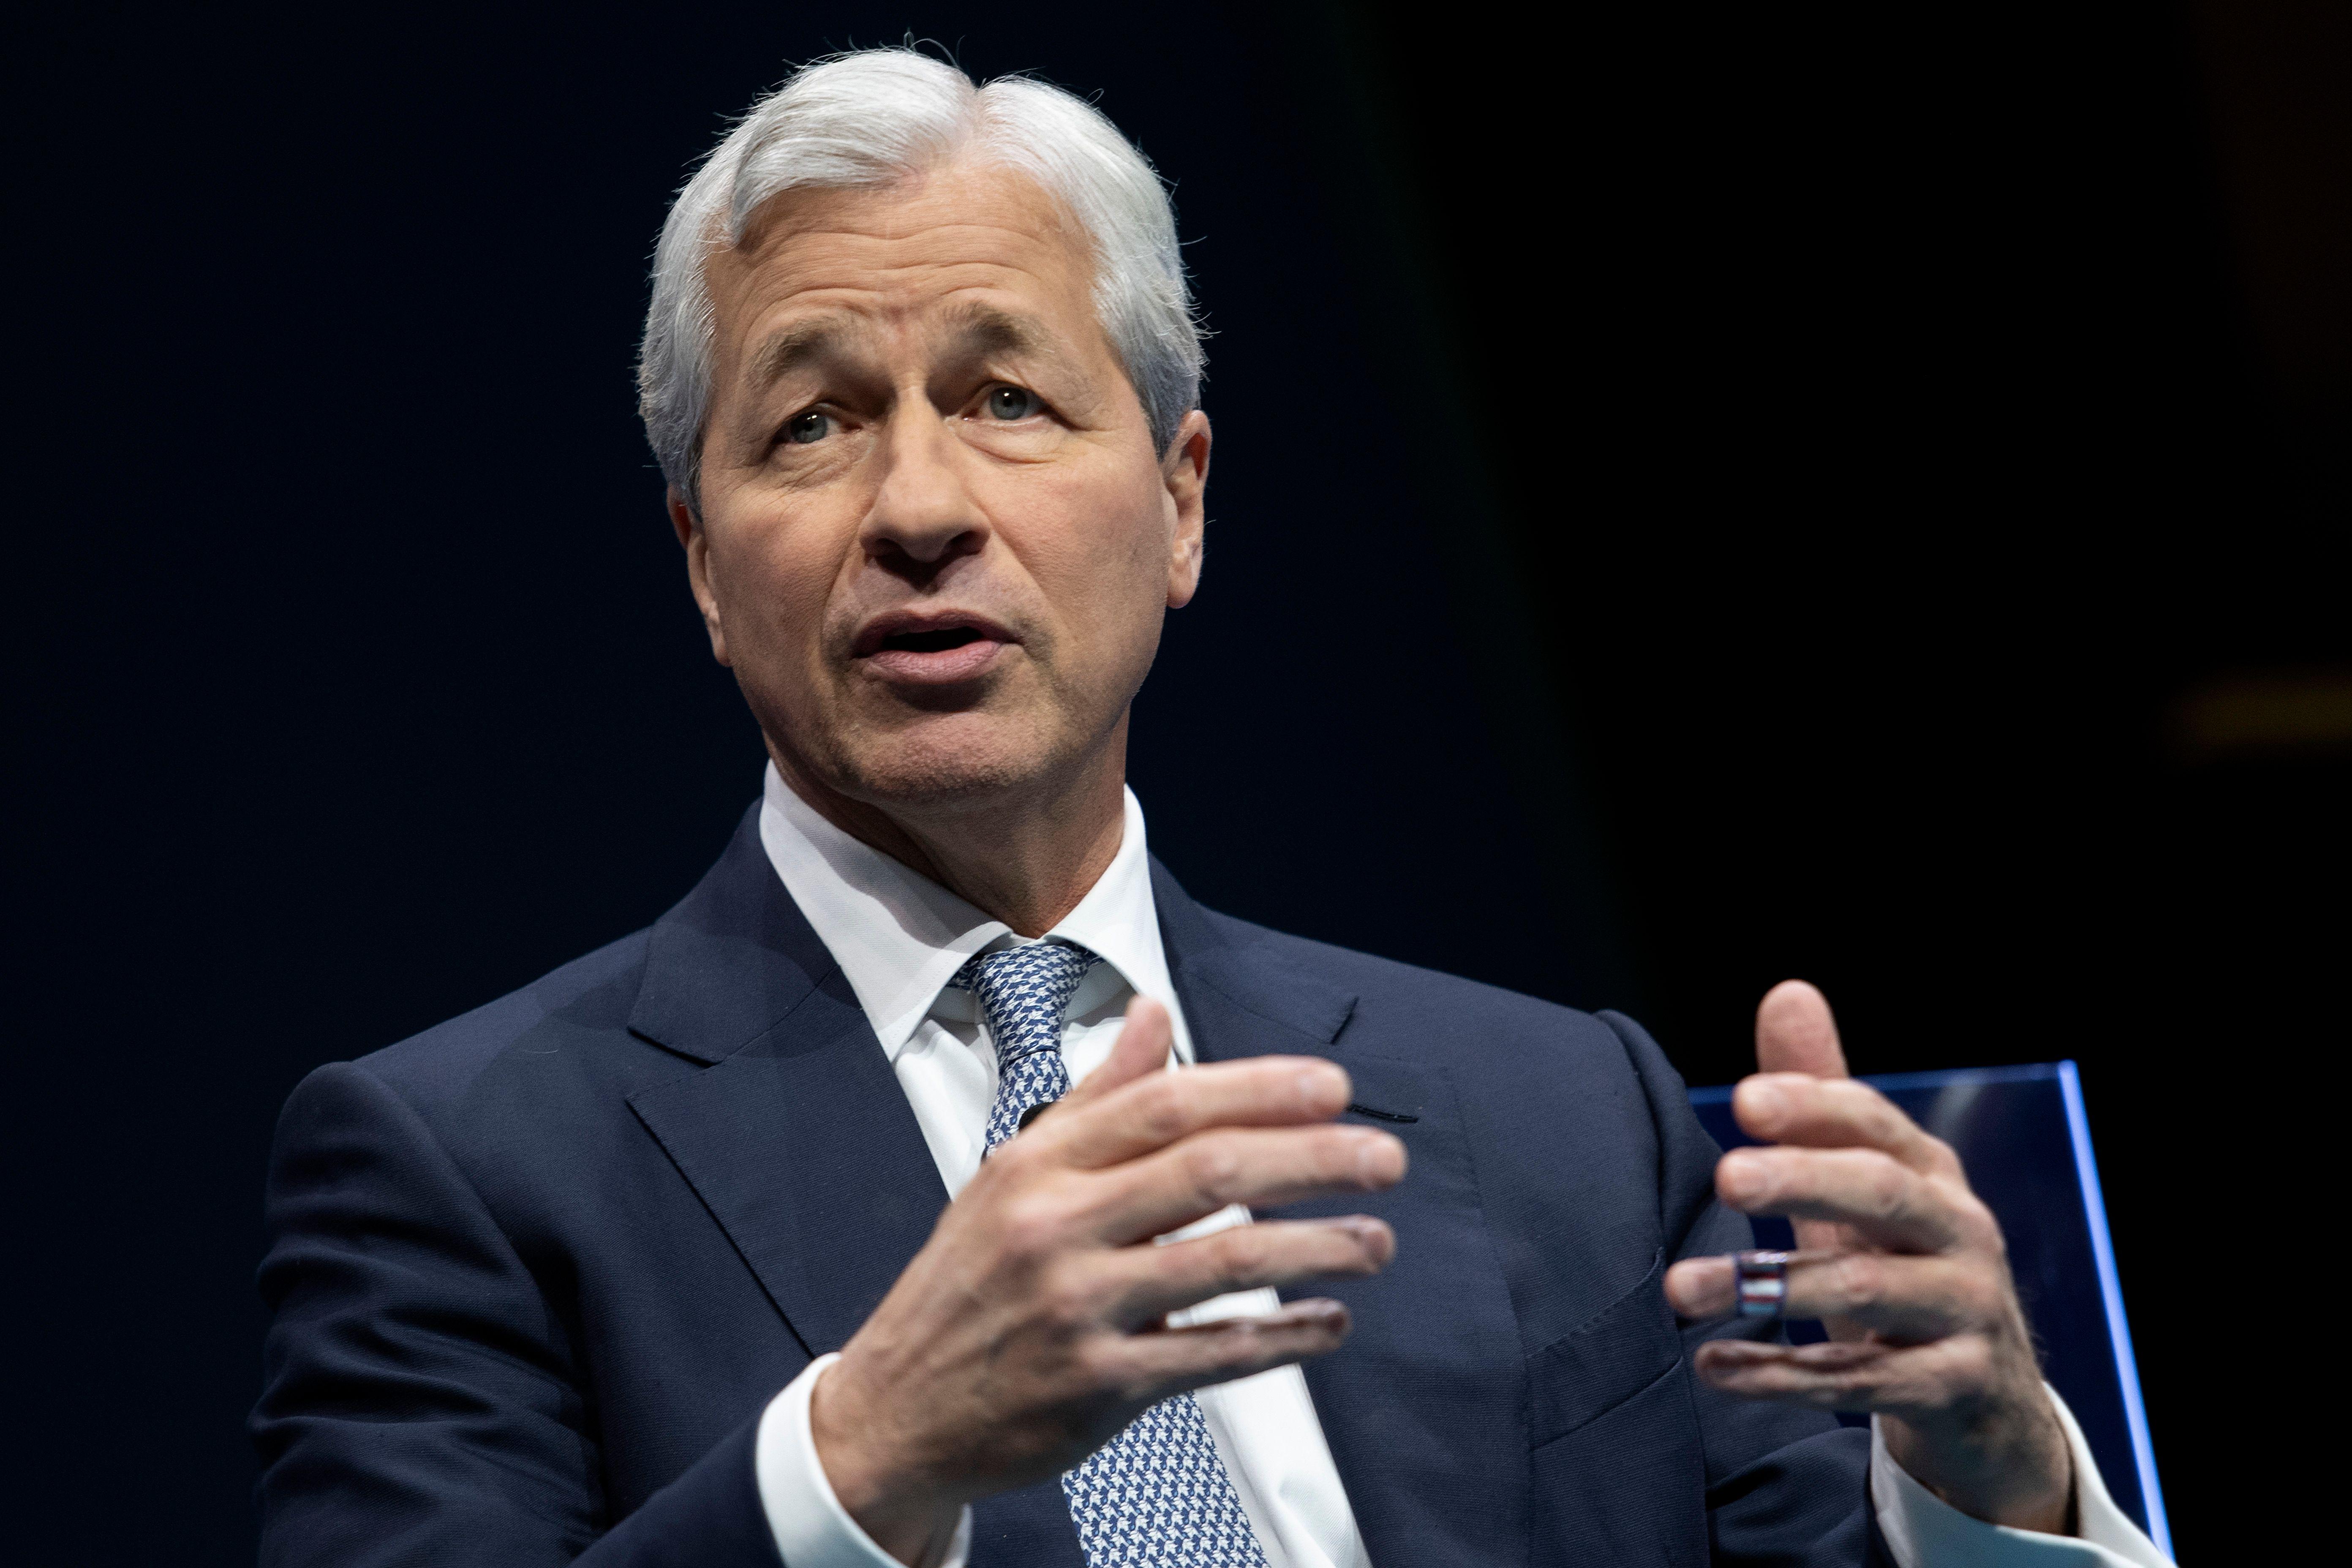 JPMorgan Chase Jamie Dimon